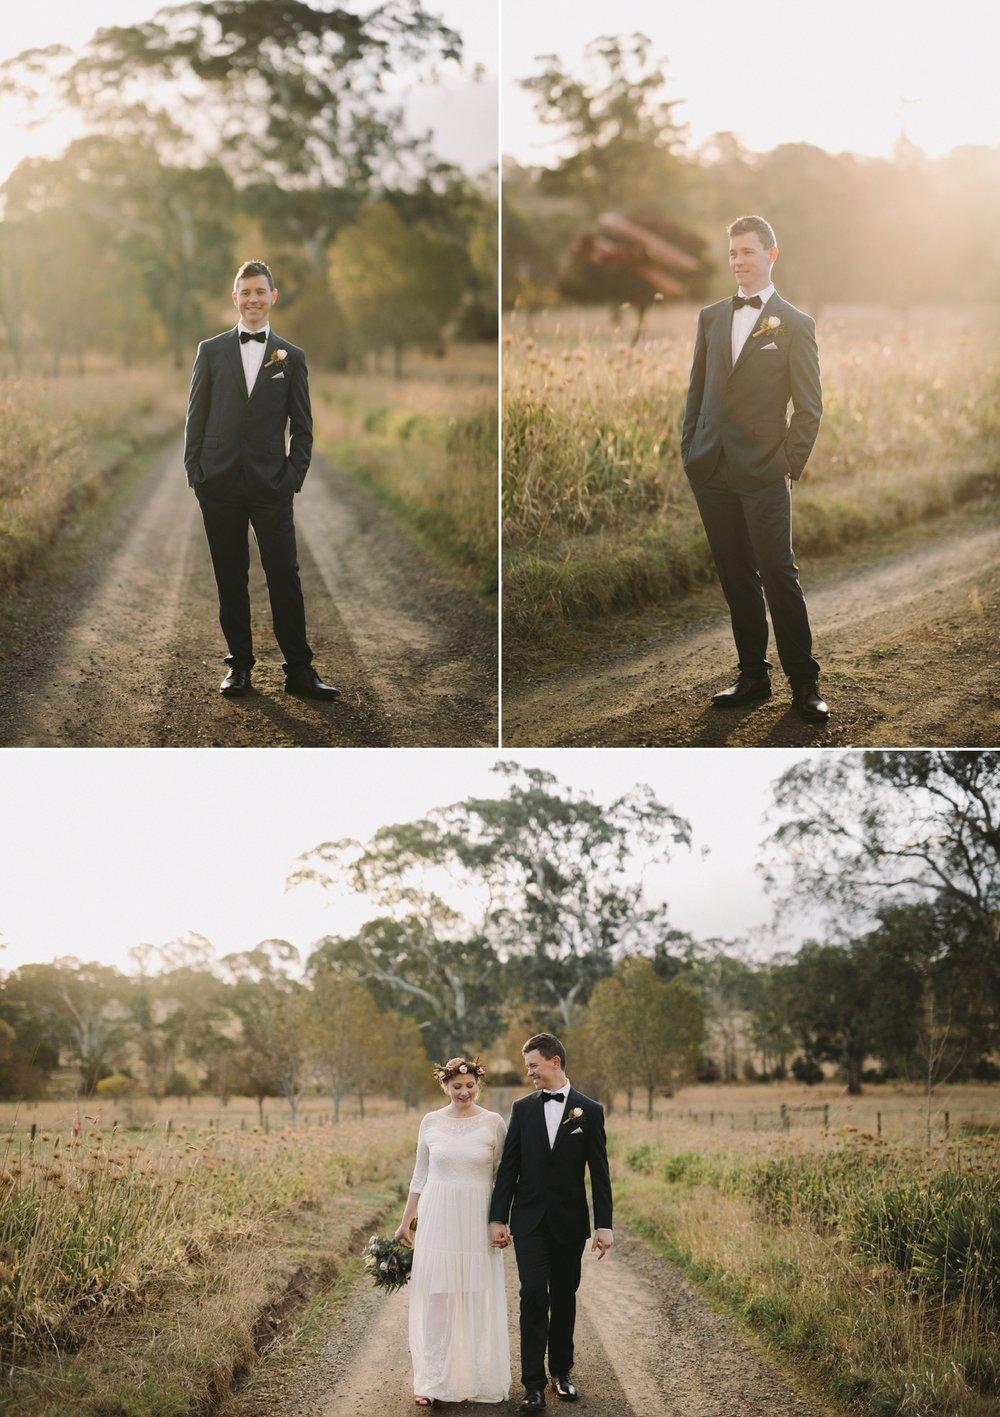 Jo & Aaron - Natural Wedding Photography in Adelaide - Beautiful, modern wedding photographer - Al Ru Farm Wedding Photography - Katherine Schultz_0033.jpg